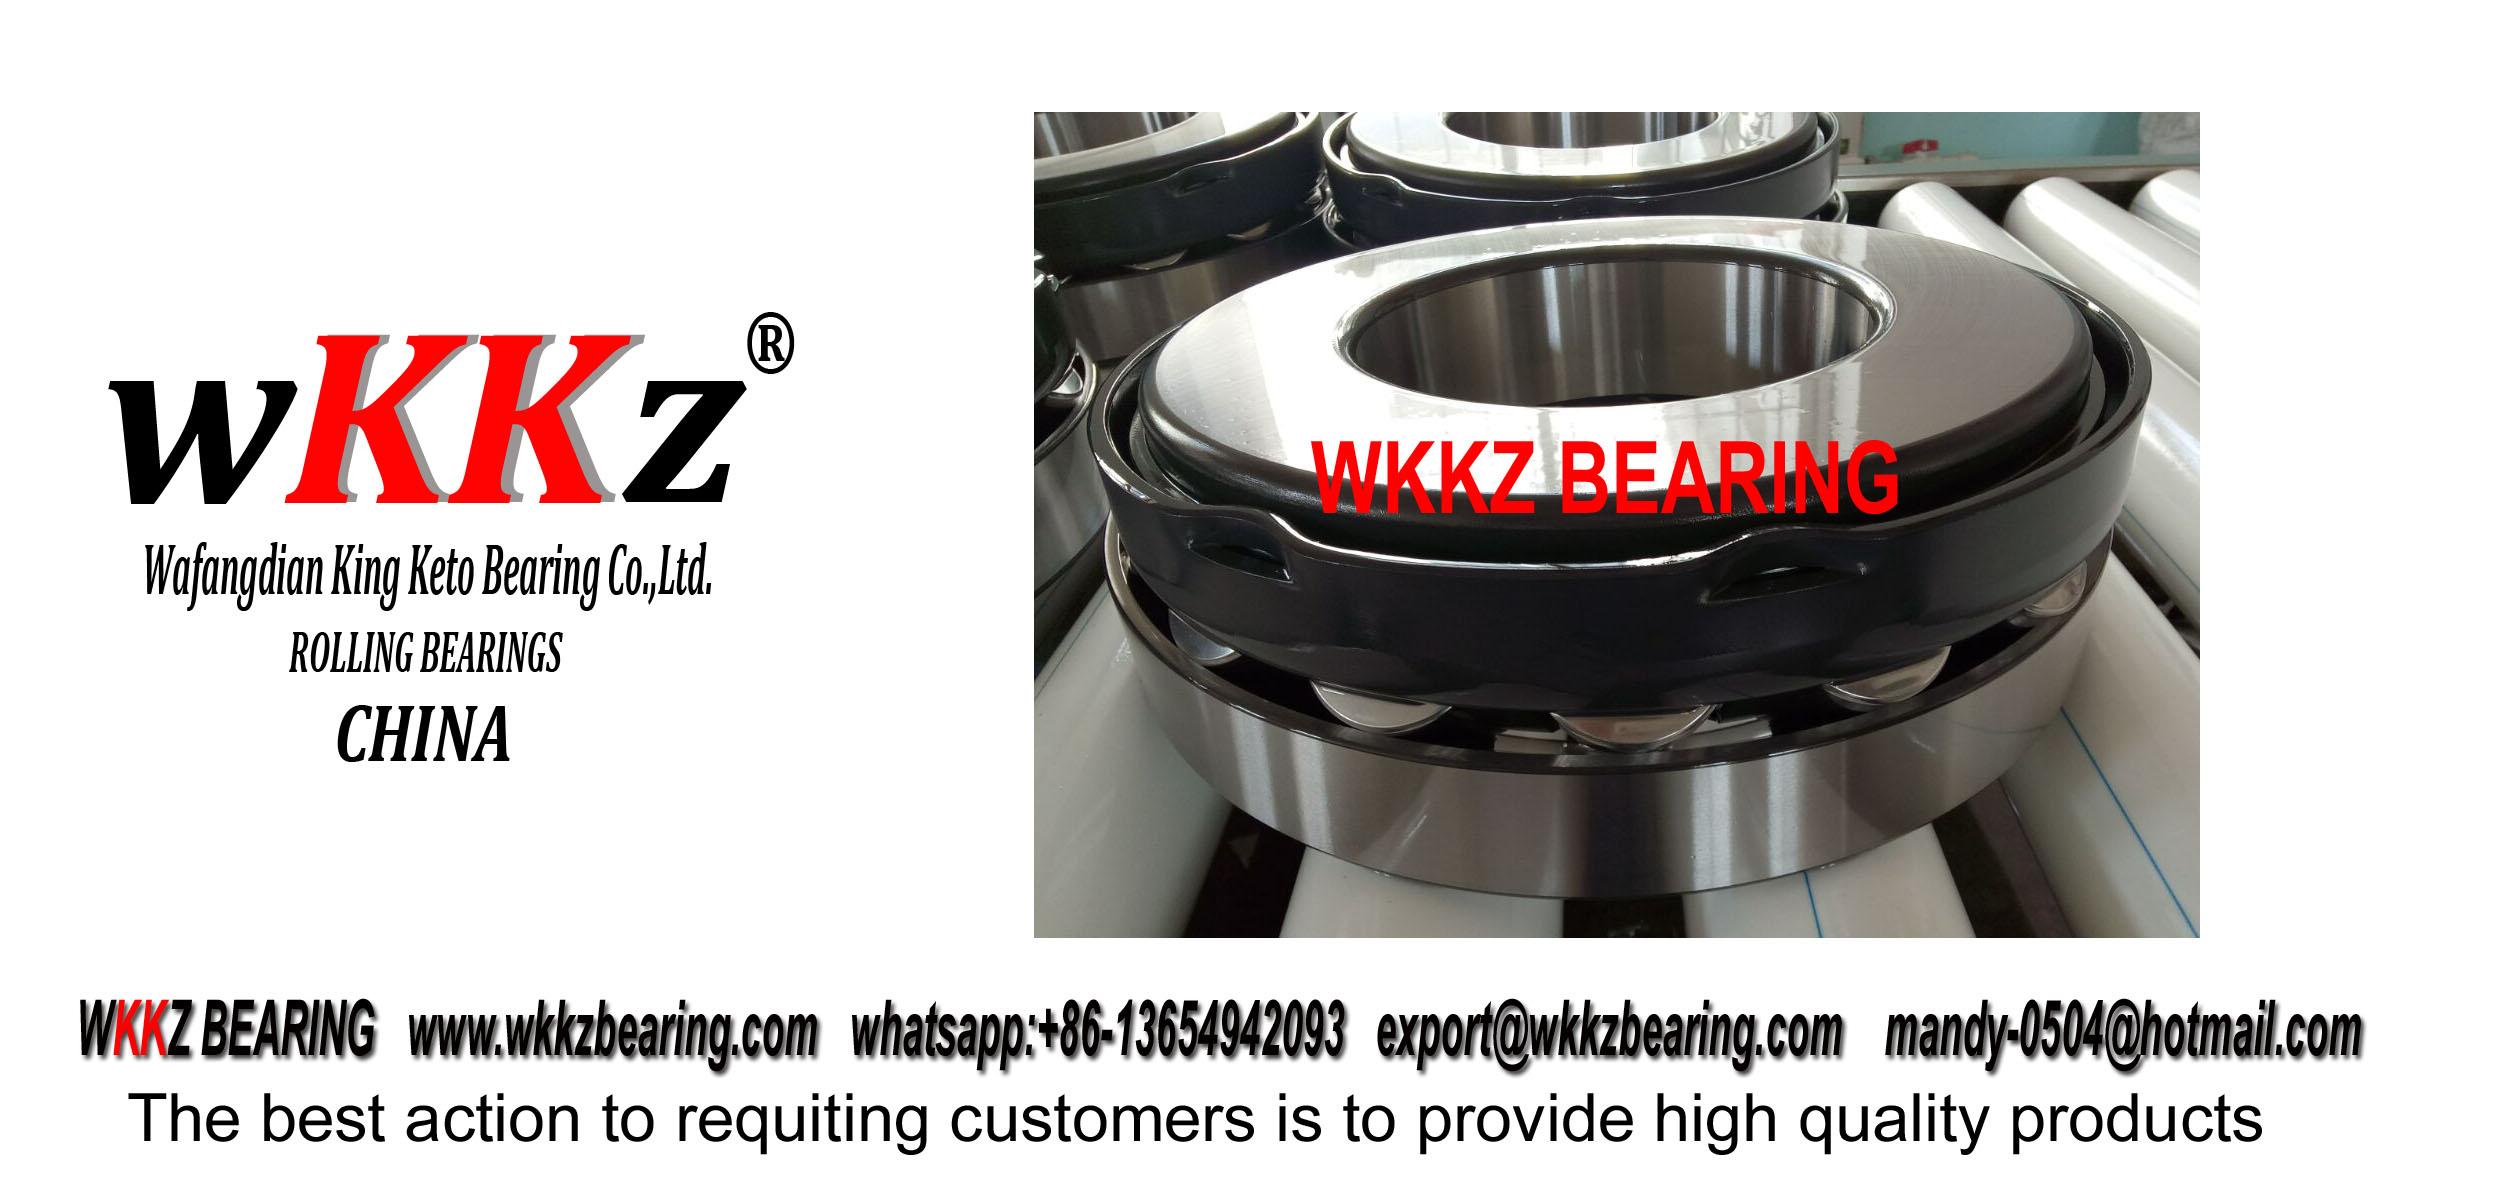 29430E thrust bearing,spherical roller thrust bearing,WKKZ BEARING,China